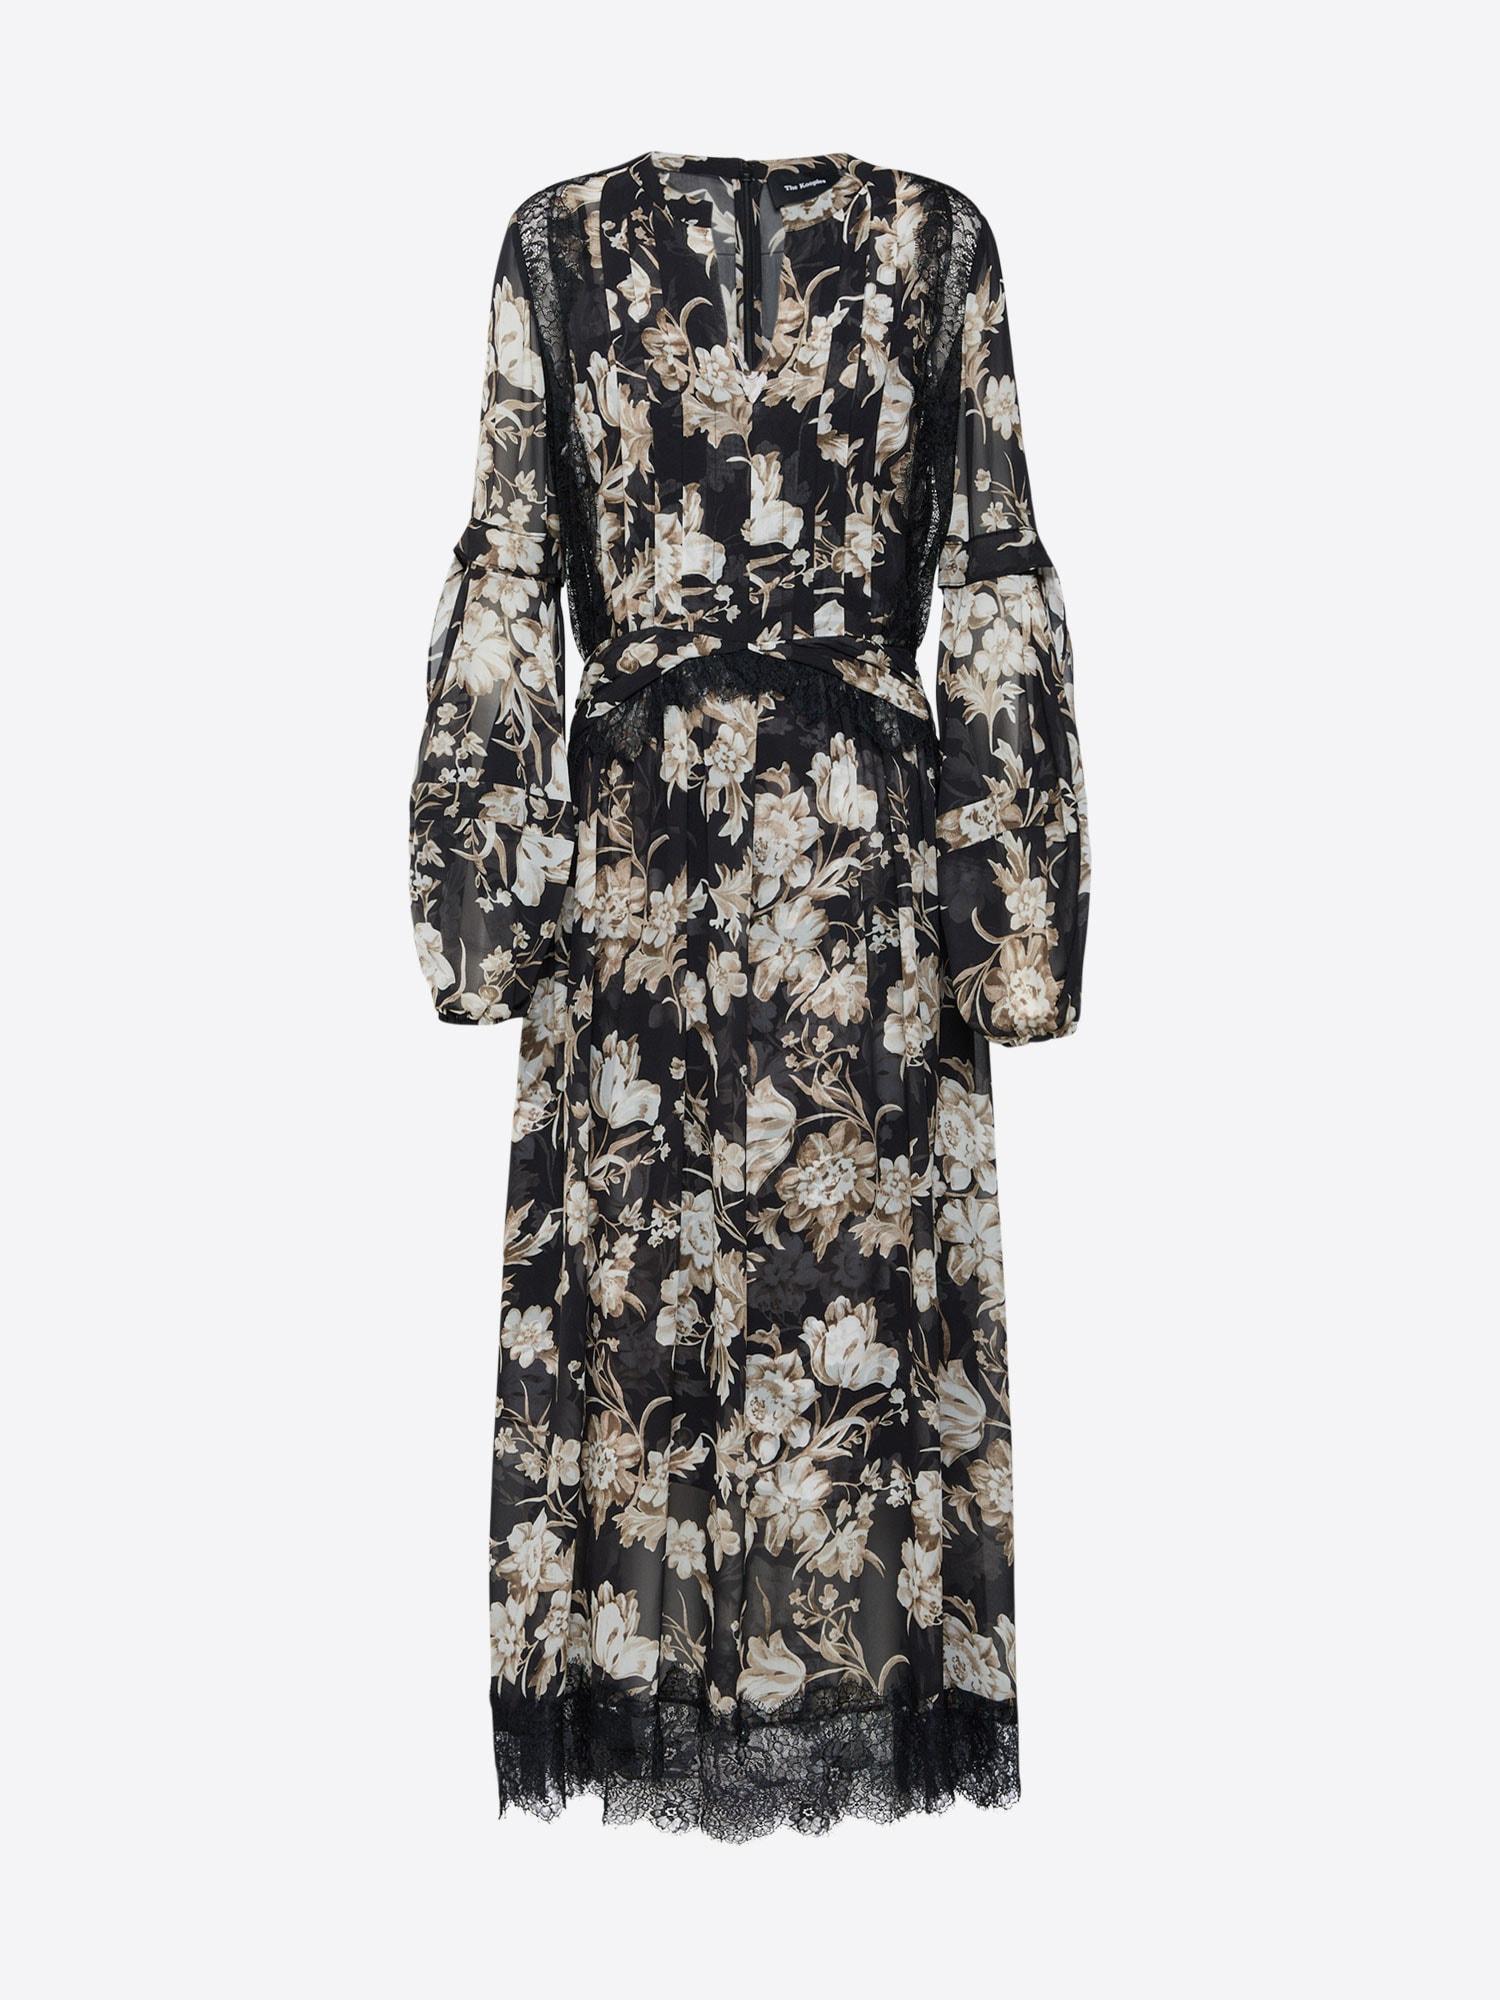 The Kooples Kleid schwarz / weiß - Schwarzes Kleid